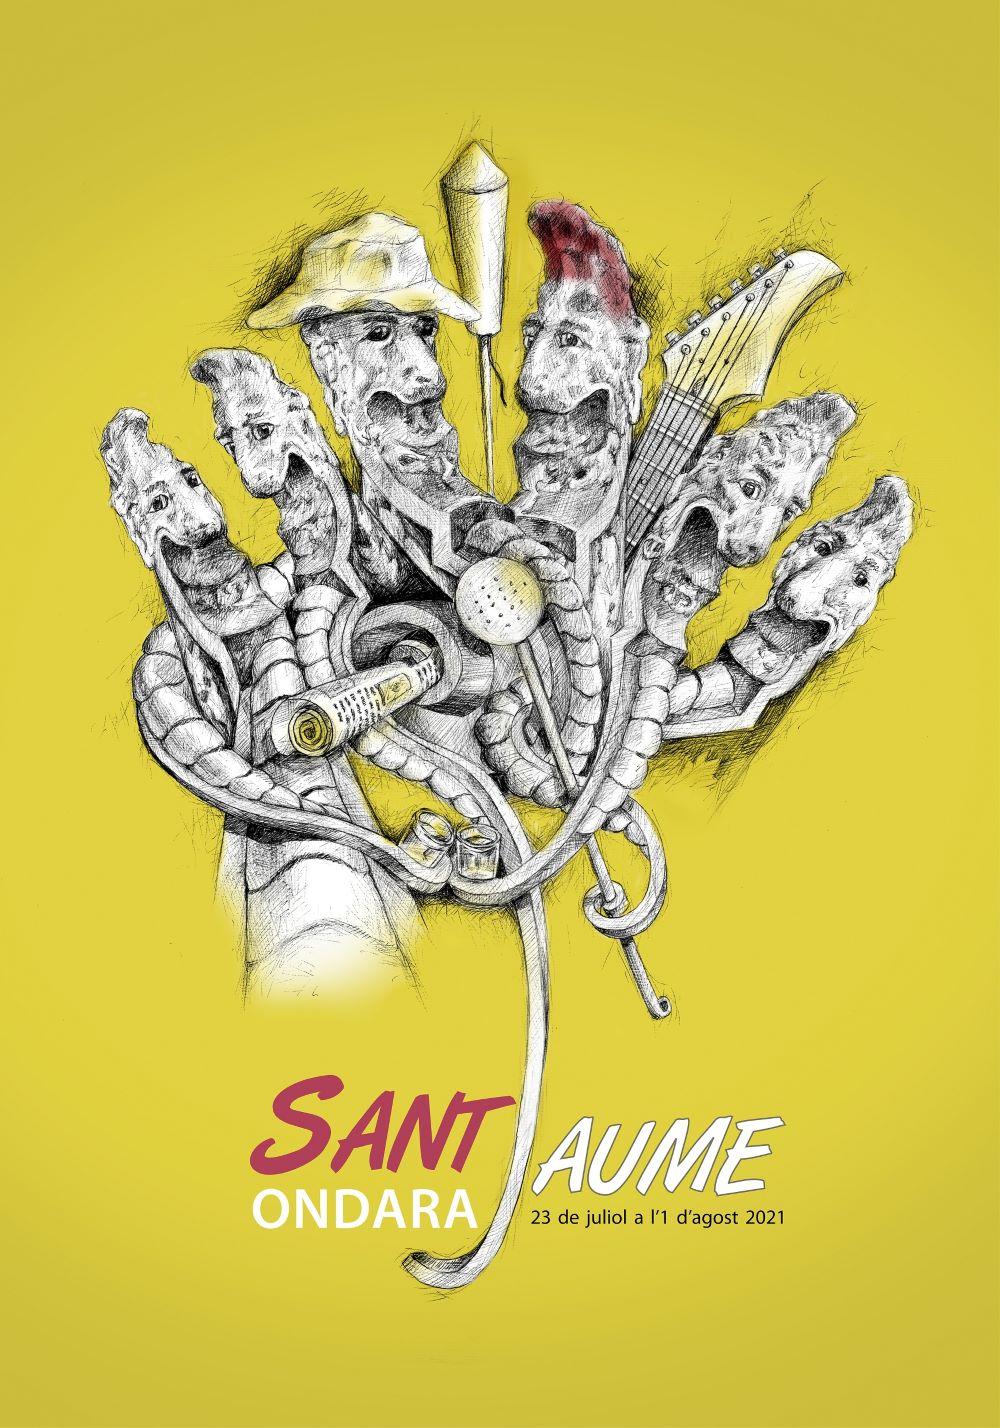 Sant Jaume